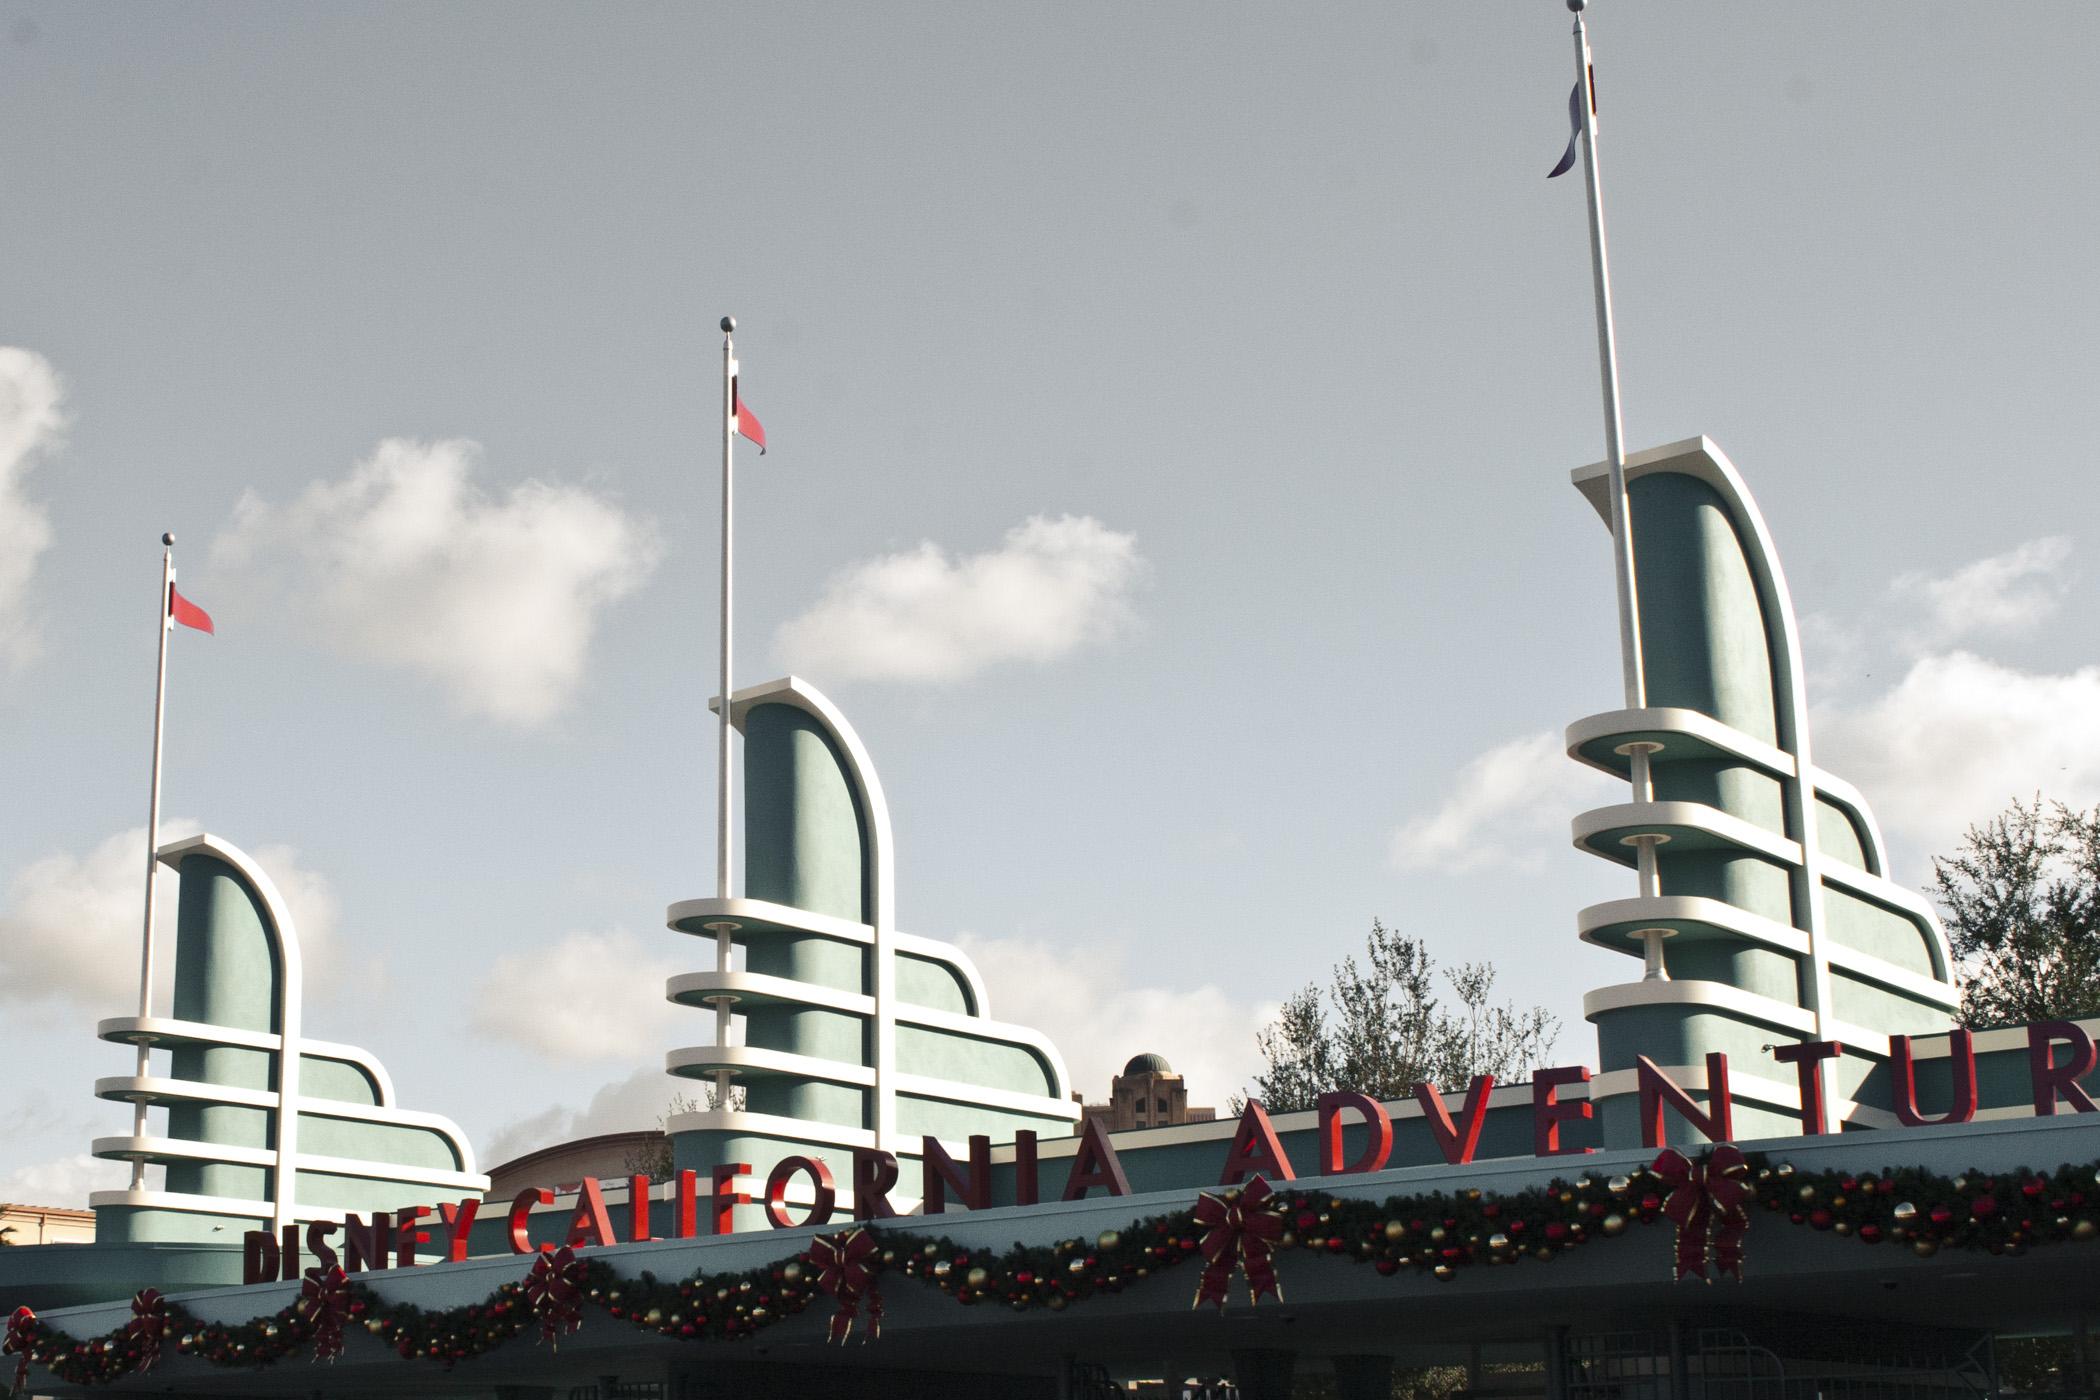 Disneyland2011_032.jpg